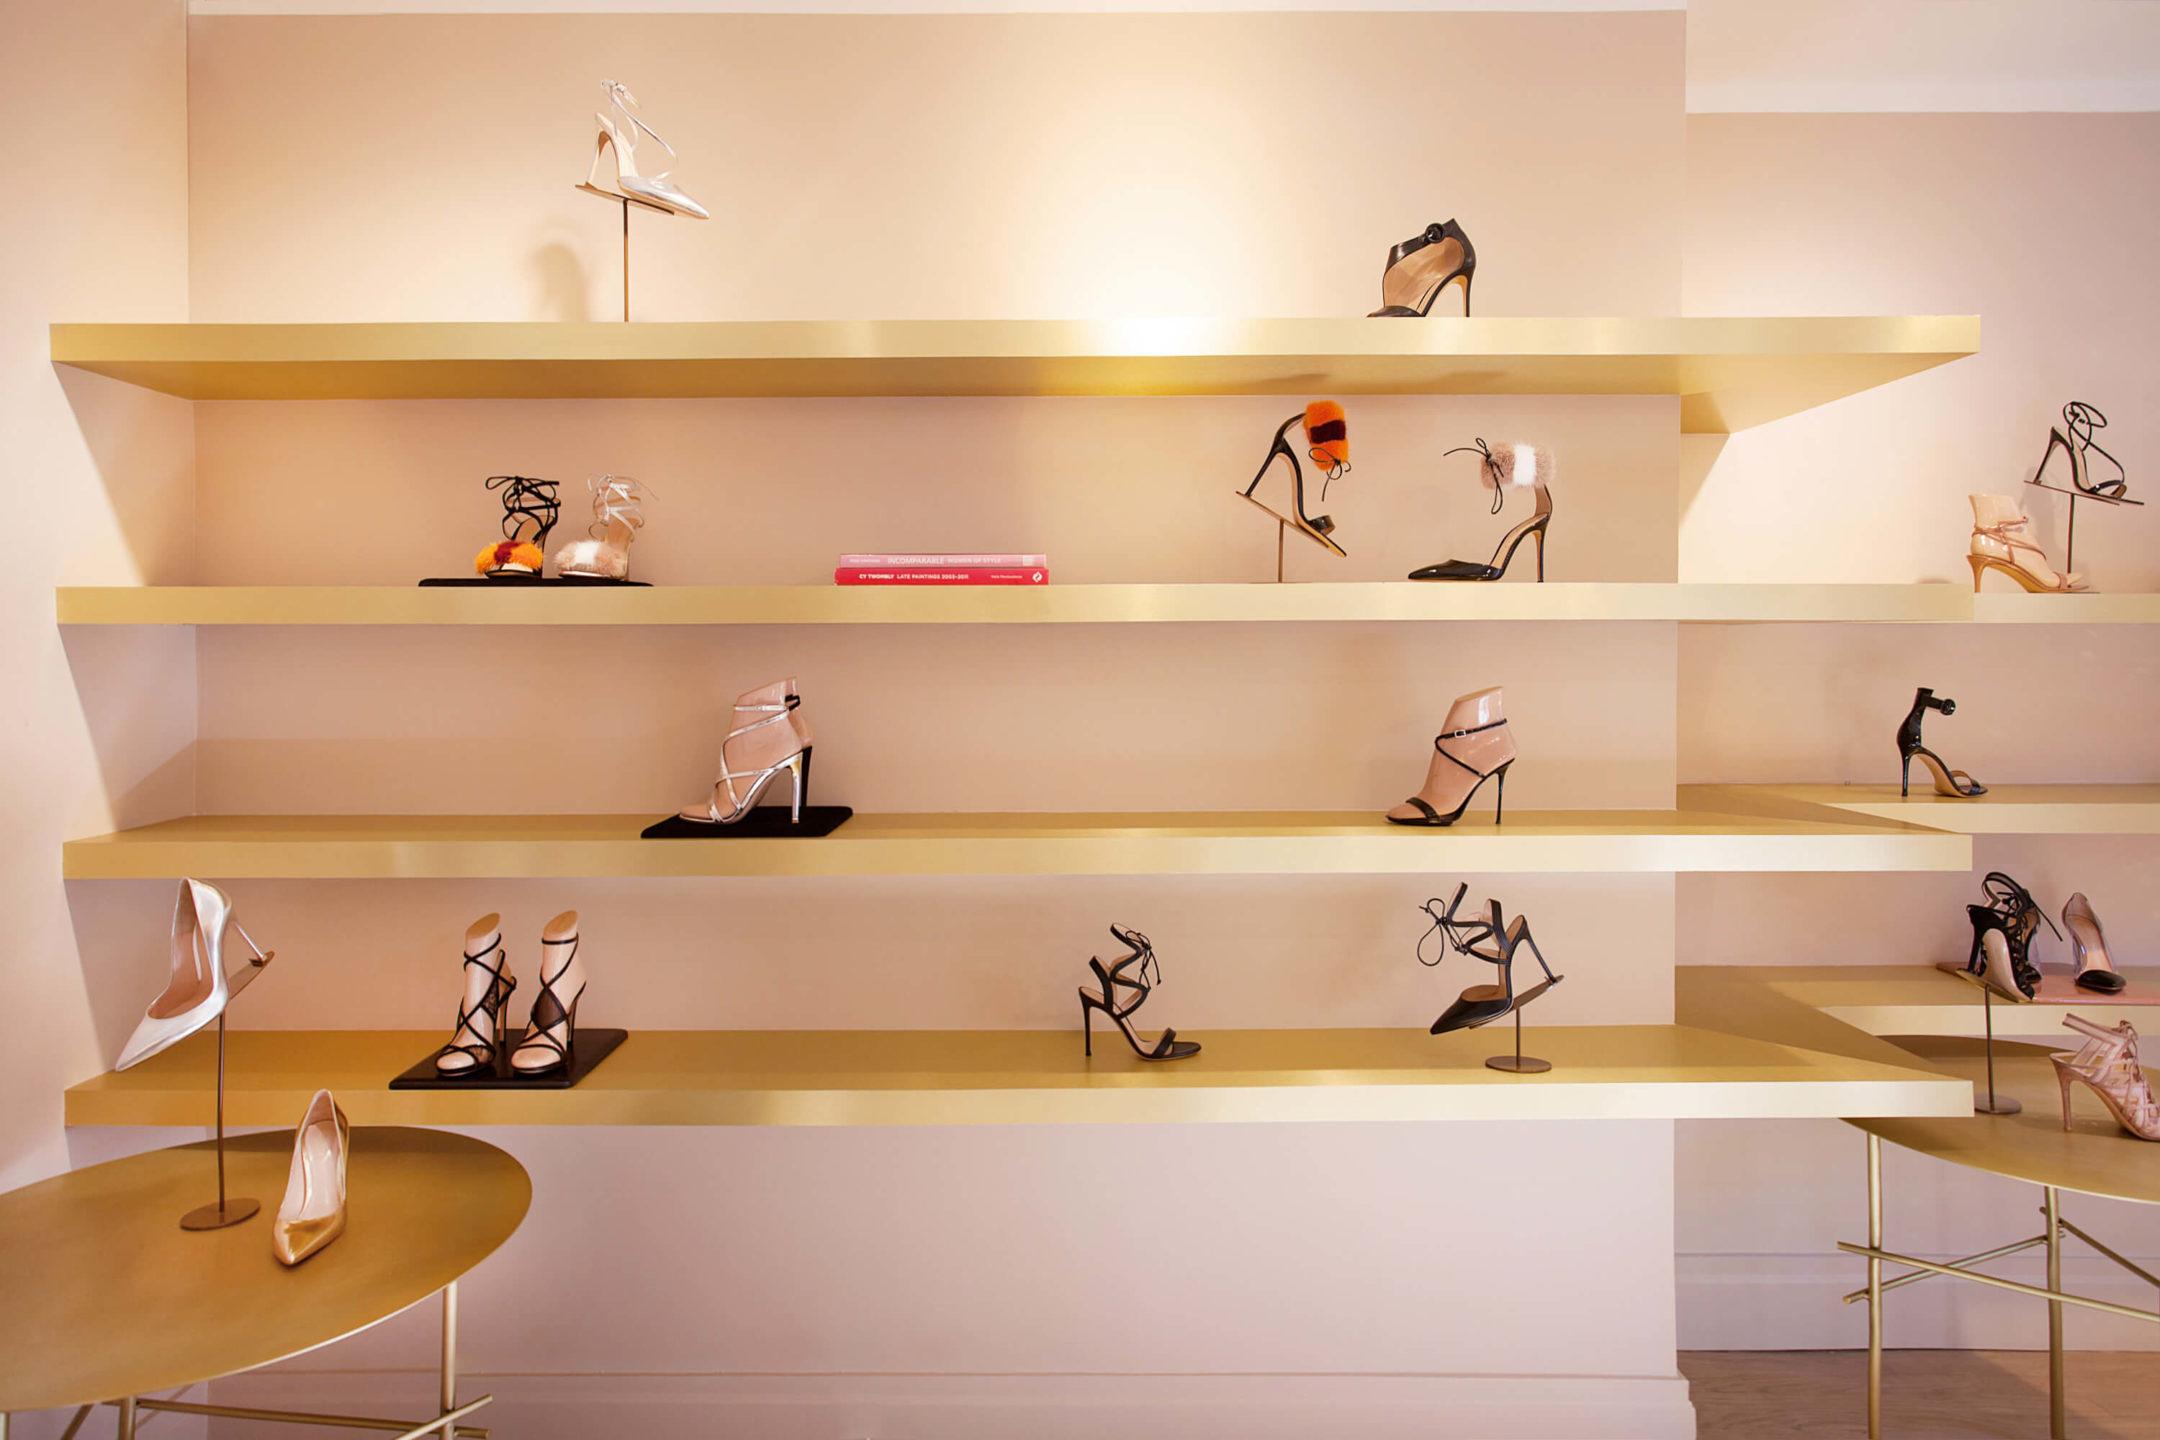 Nicole-Fuller-Florence-gianvito-rossi-atelier-new-york-interior-designer-6